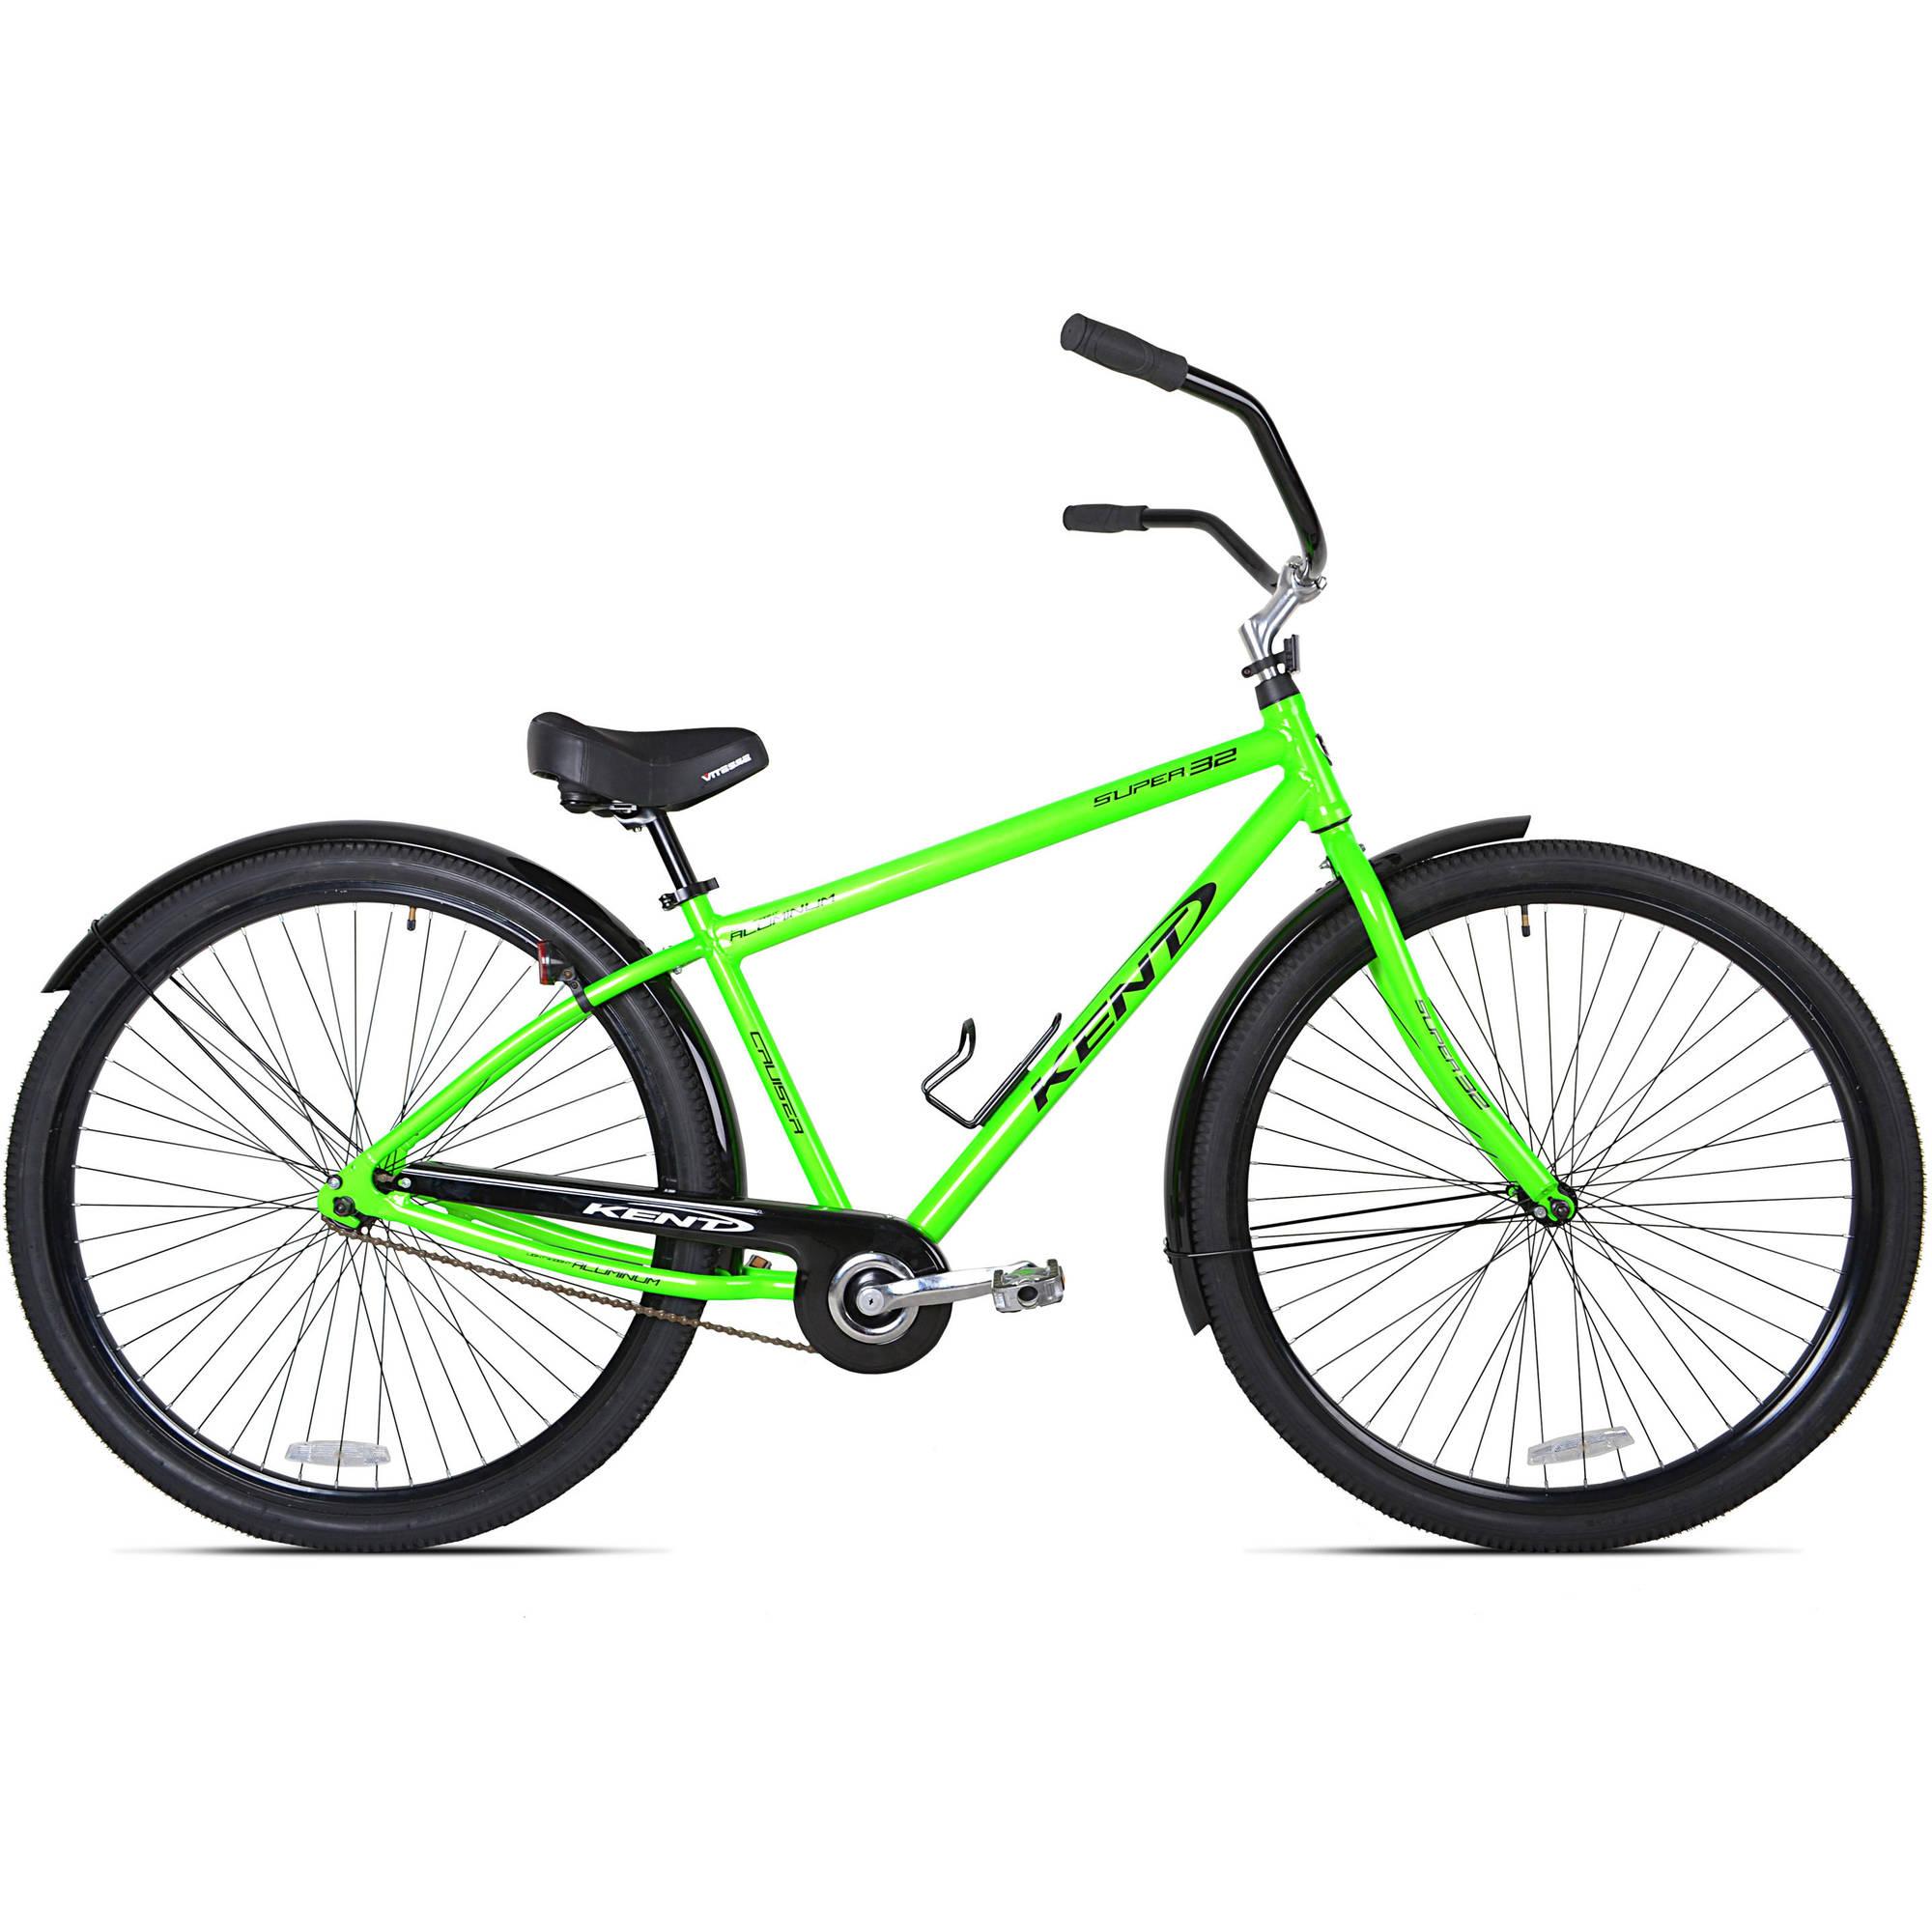 "32"" Kent Super 32 Unisex Beach Cruiser Bike, Green"